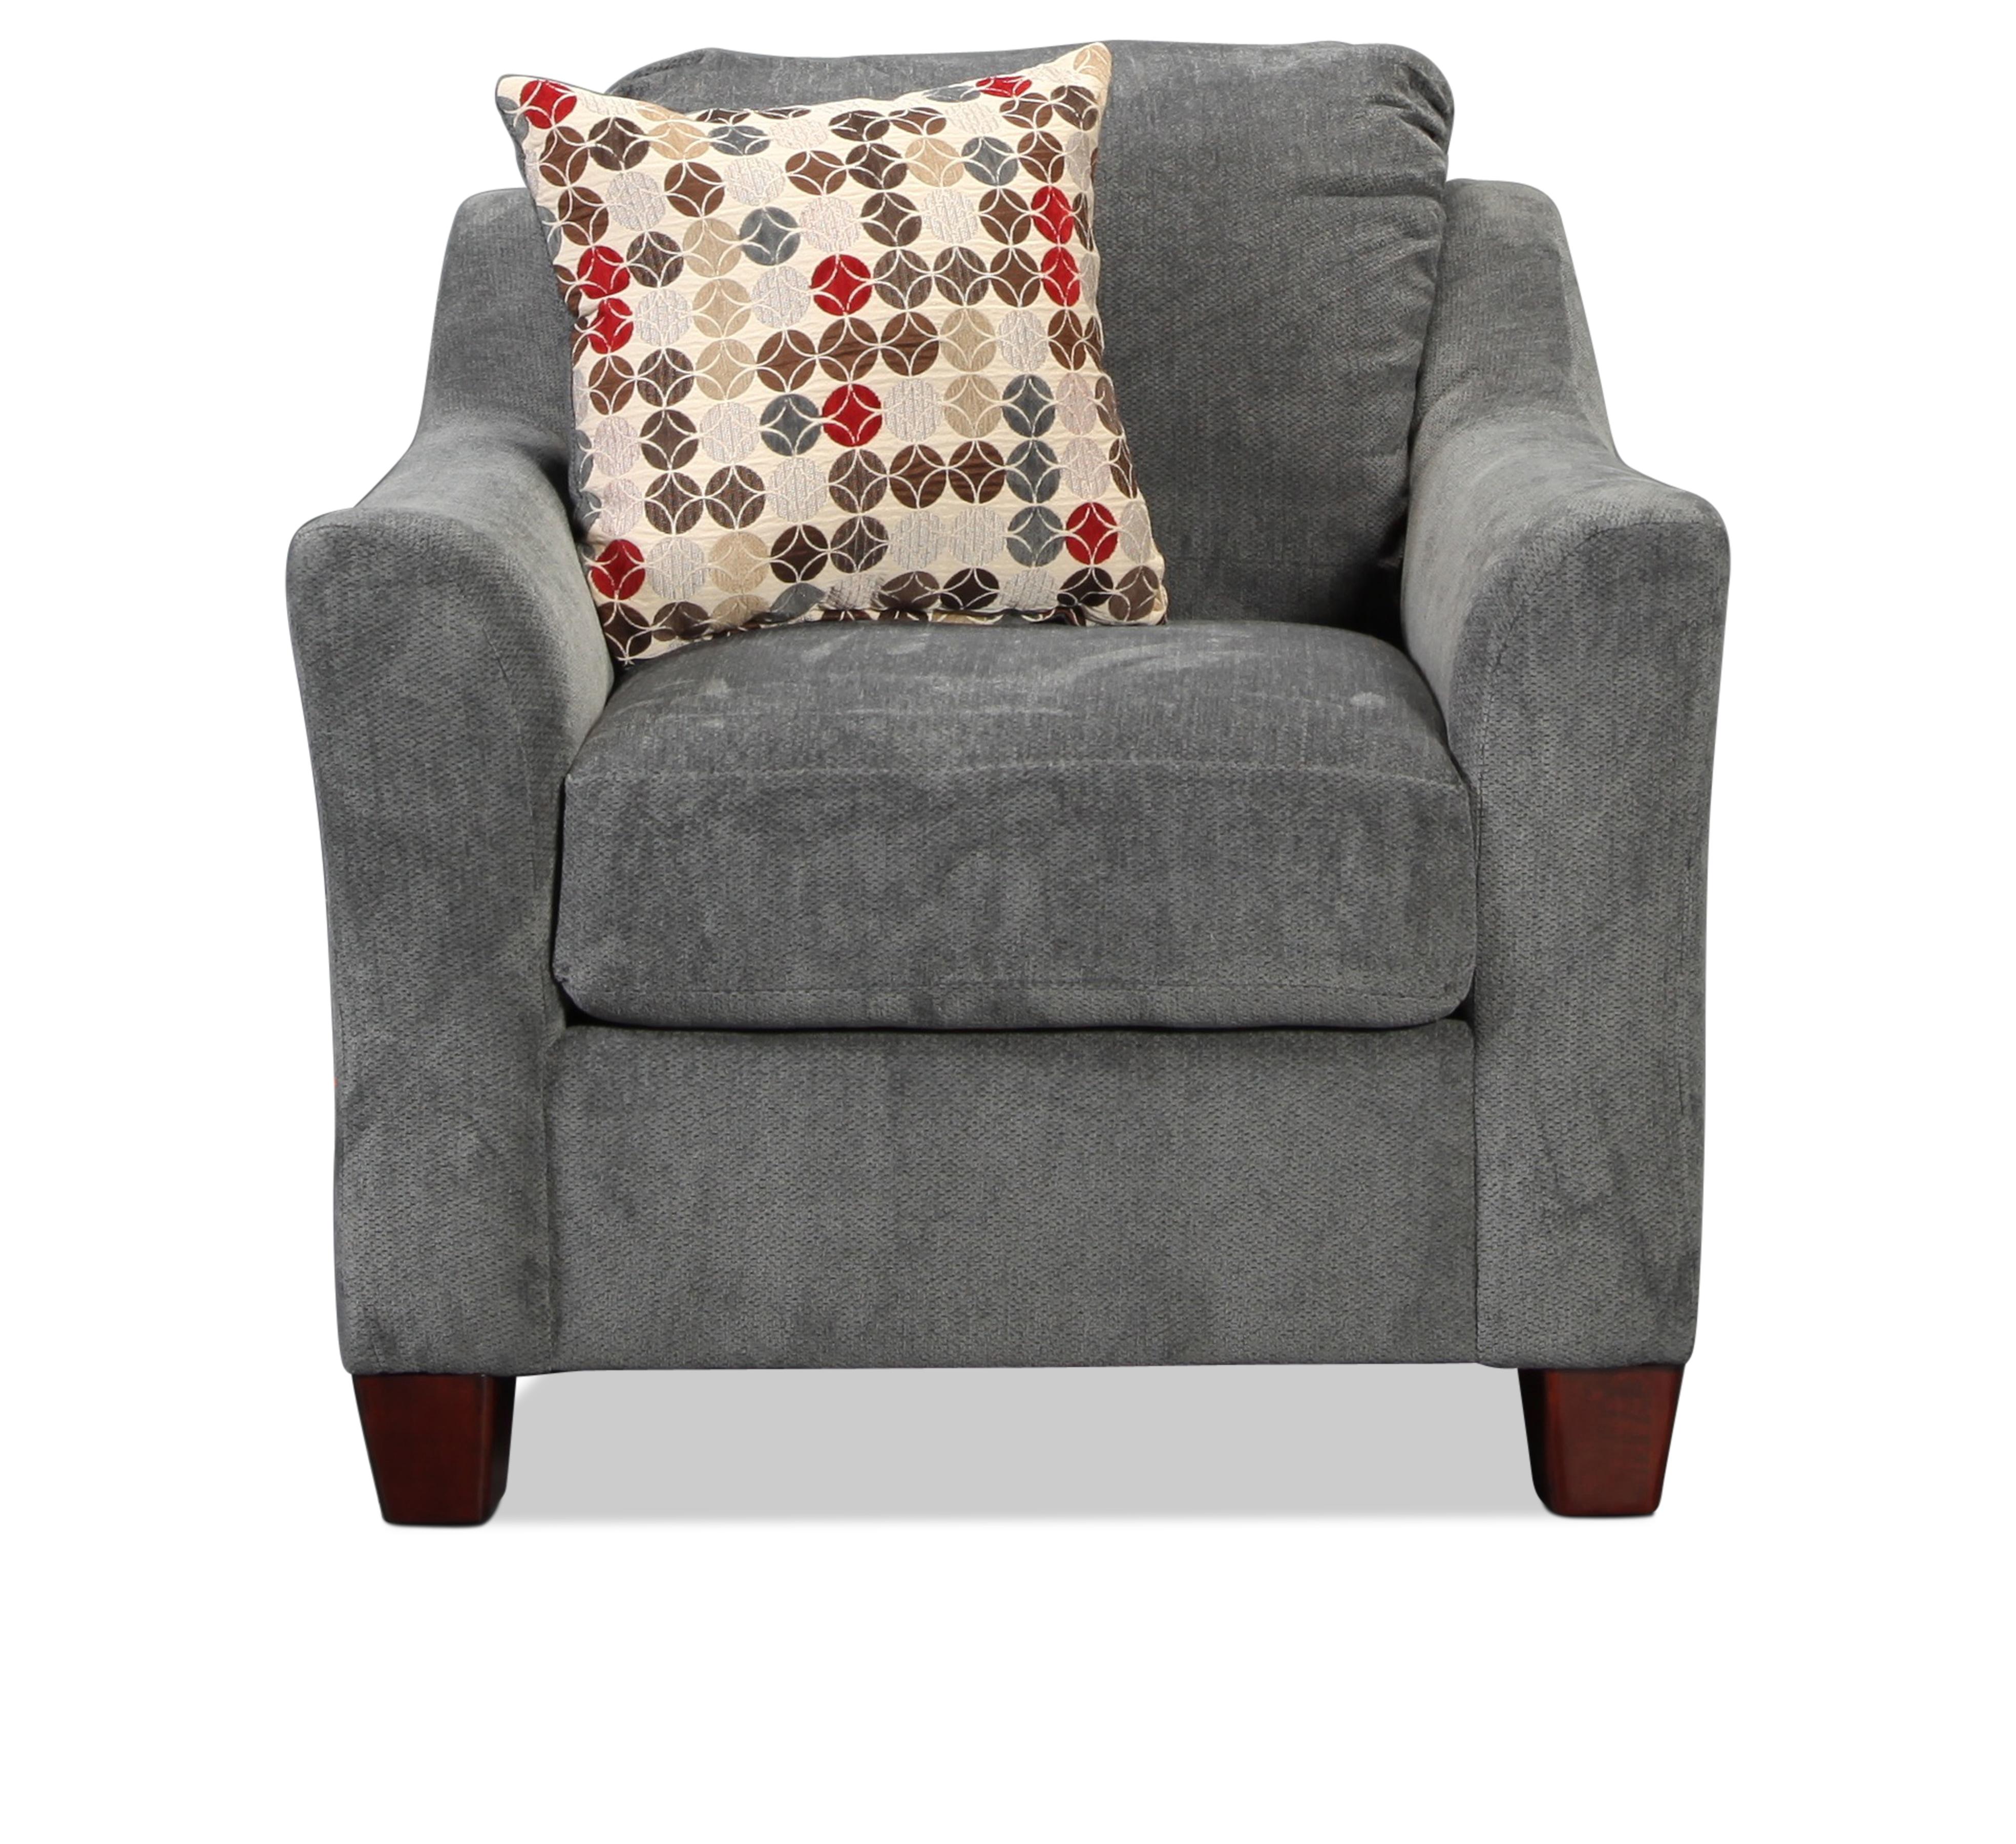 Canoga Chair- Delft